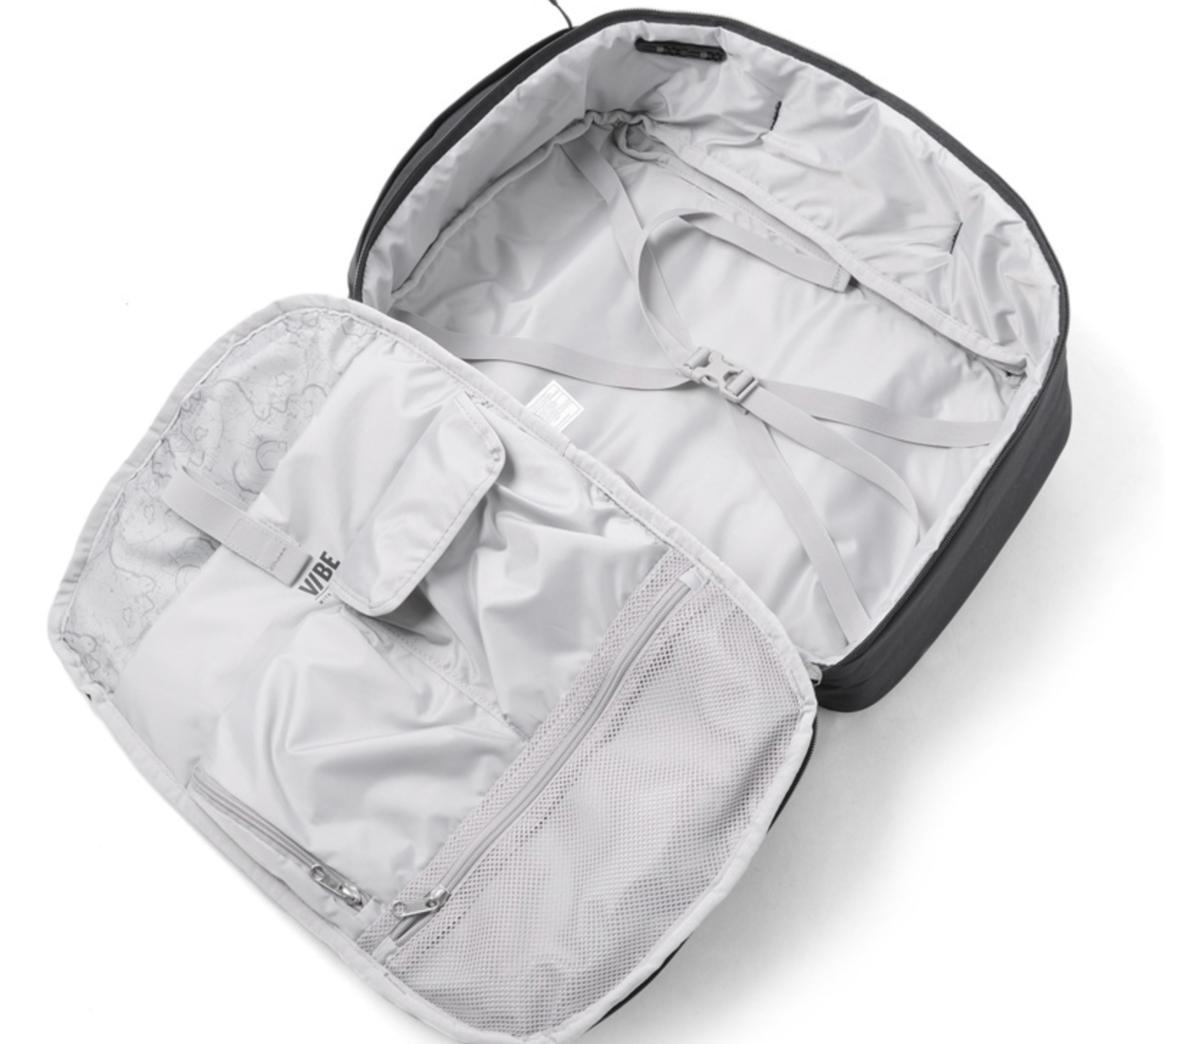 f:id:thebackpack:20190809194249p:plain